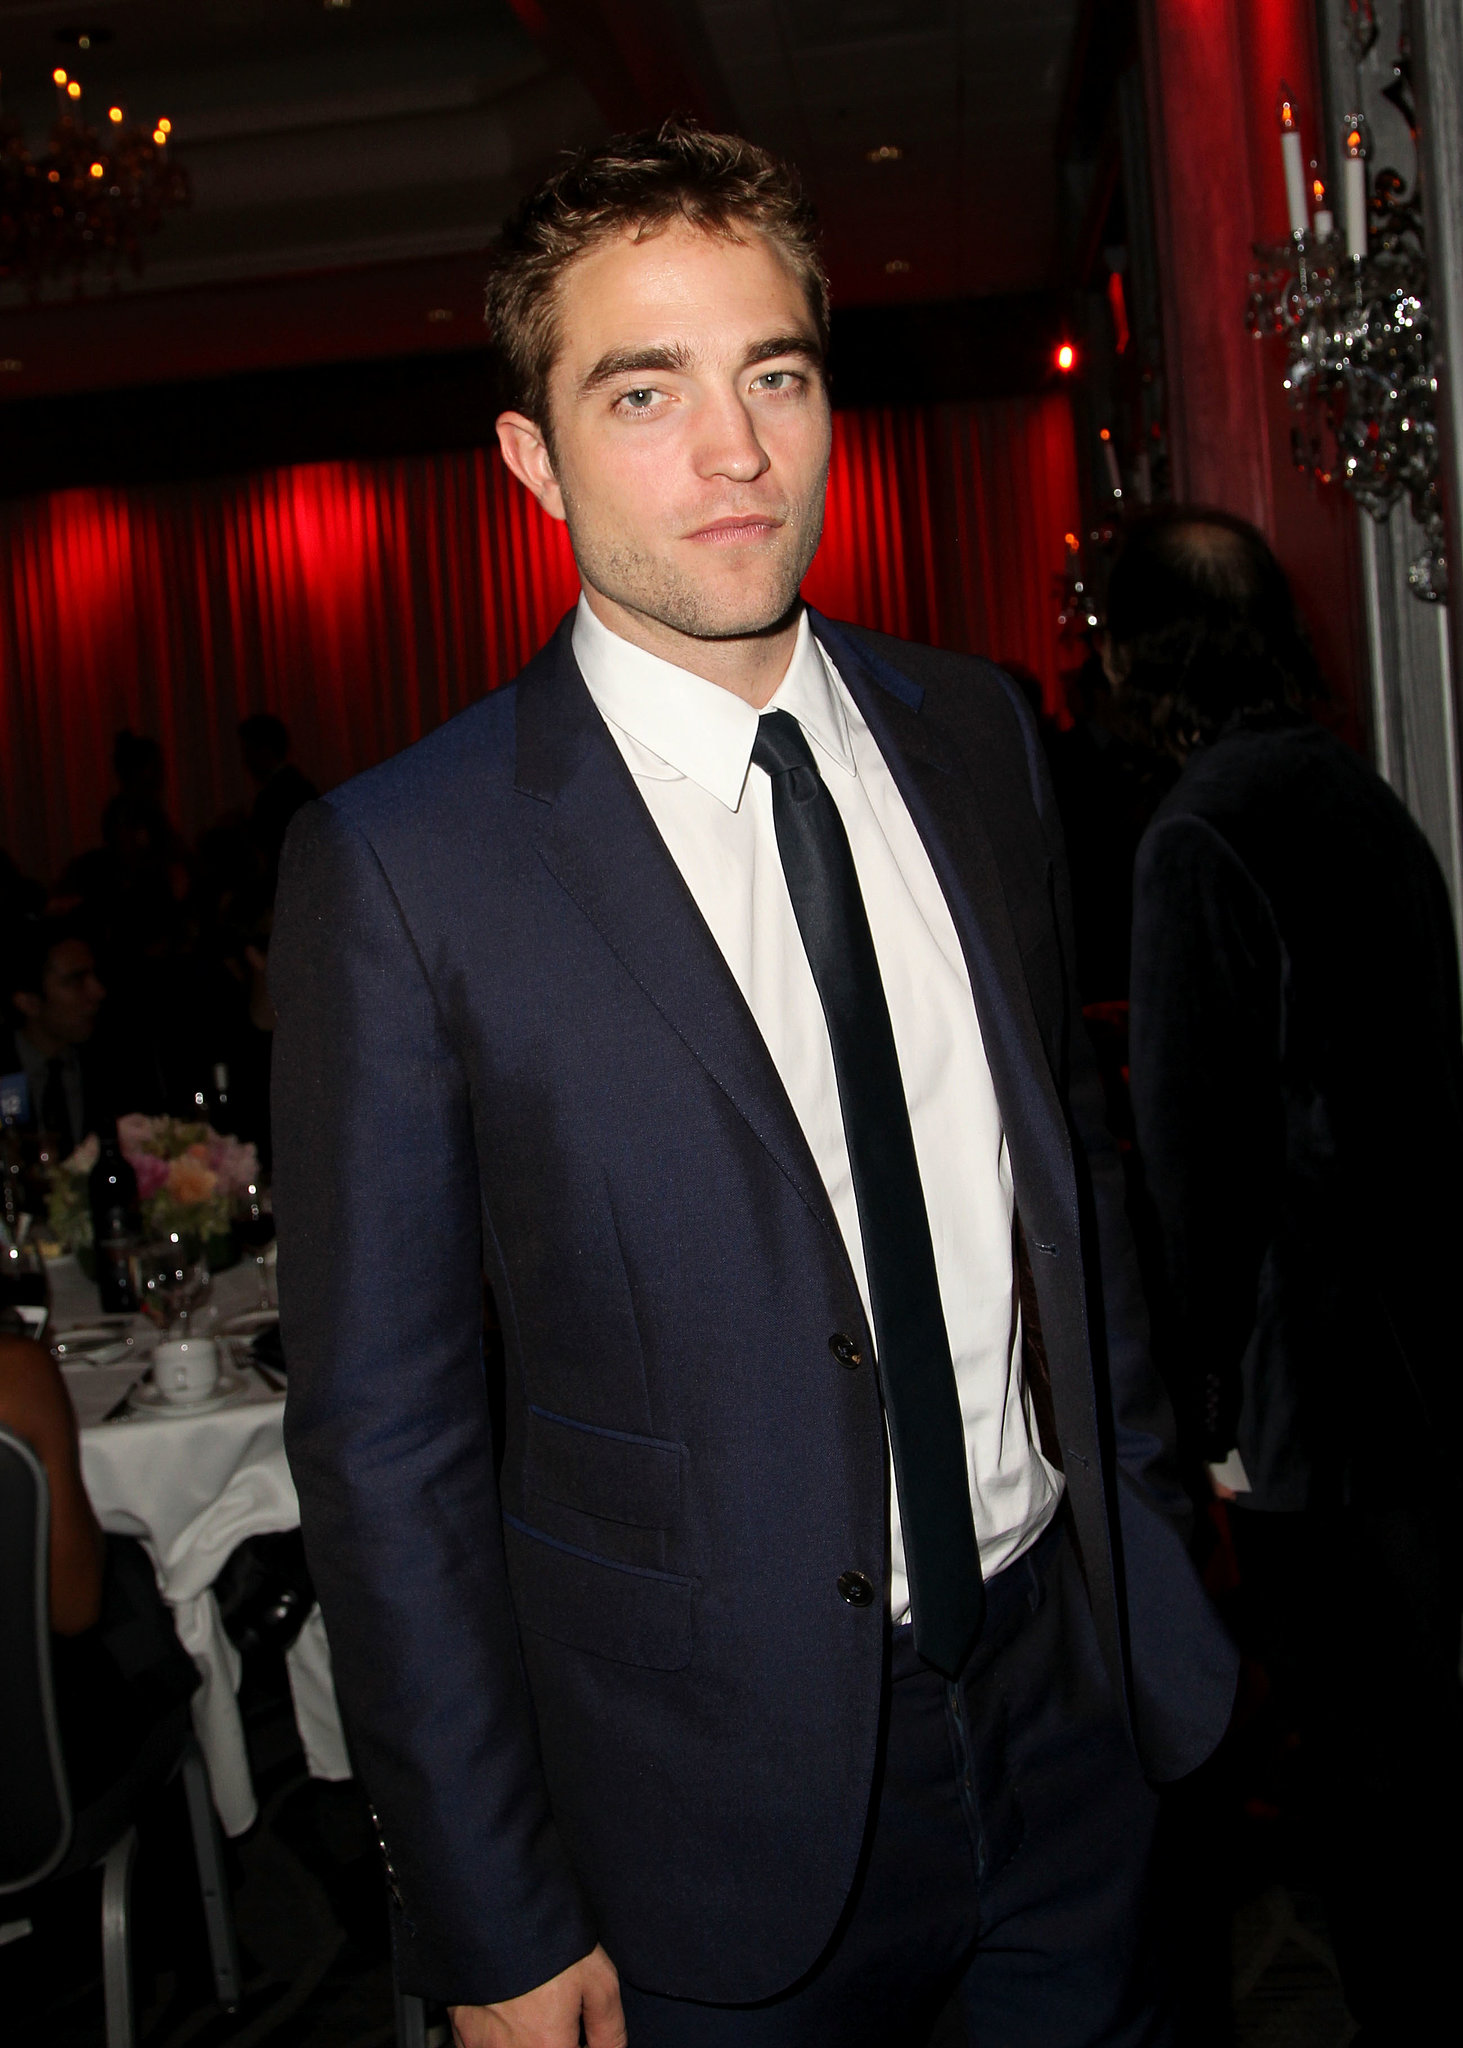 The Joke We Can't Believe Robert Pattinson Made